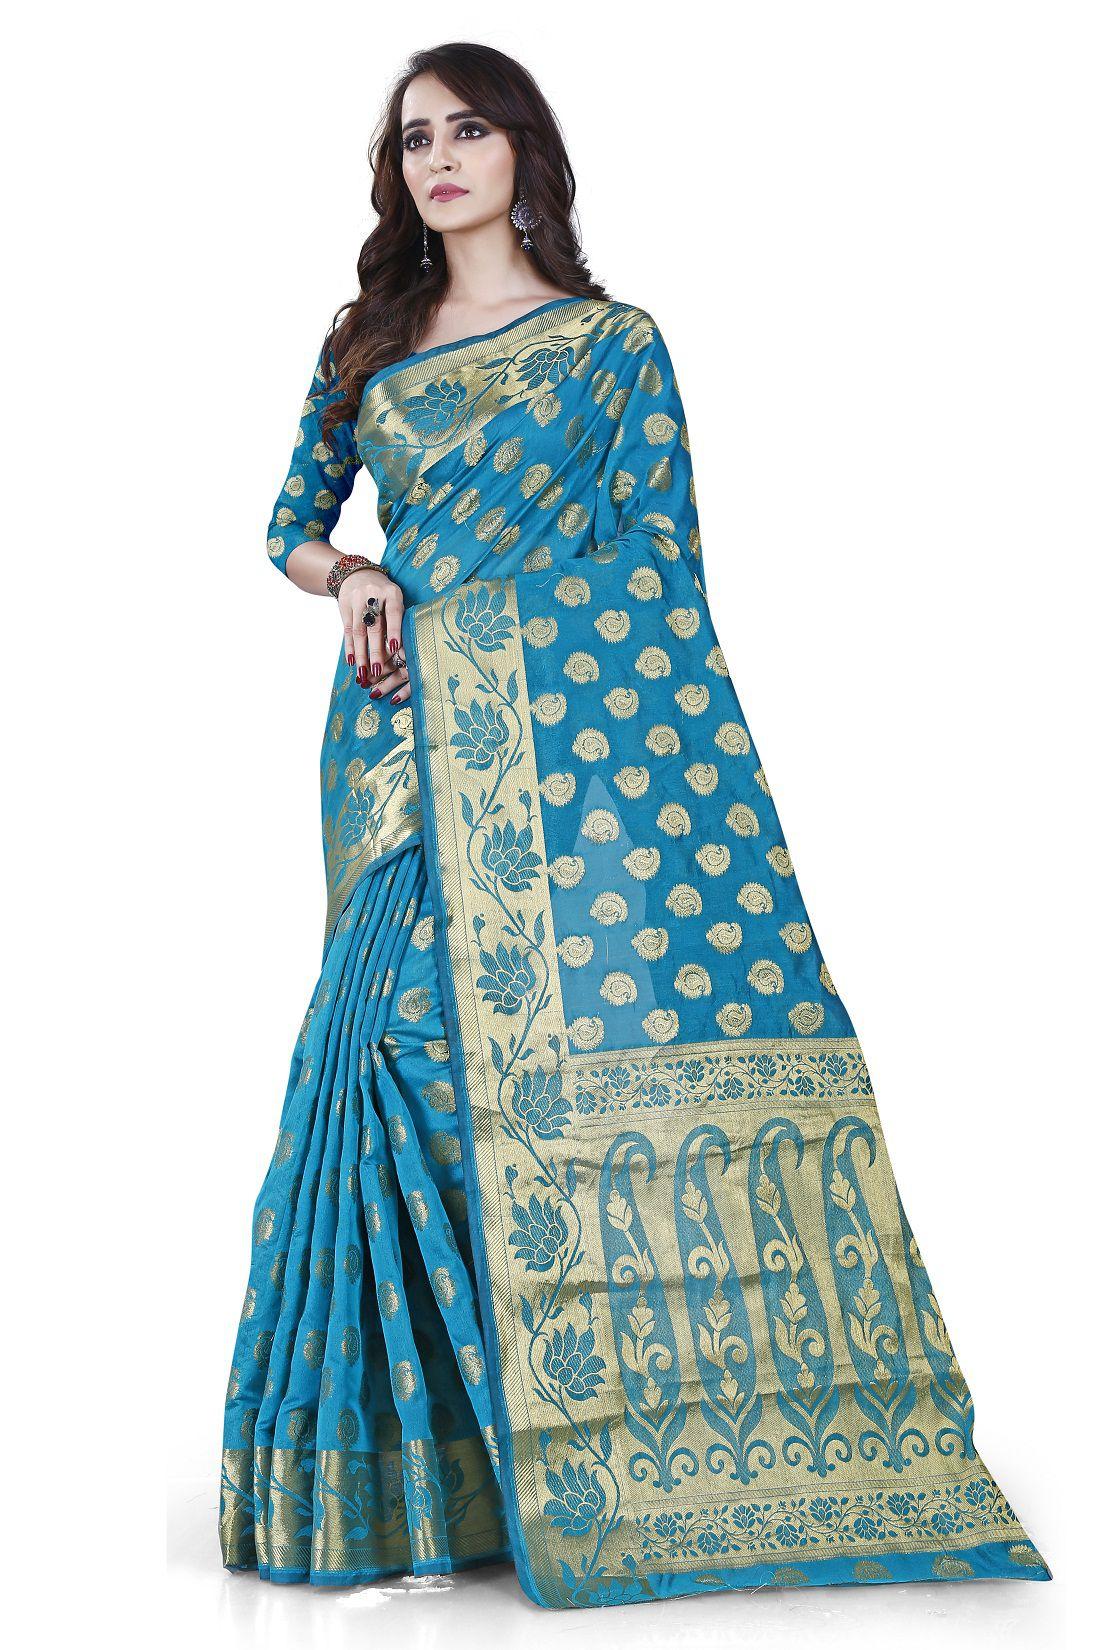 Balkrishna Texport Blue Art Silk Saree